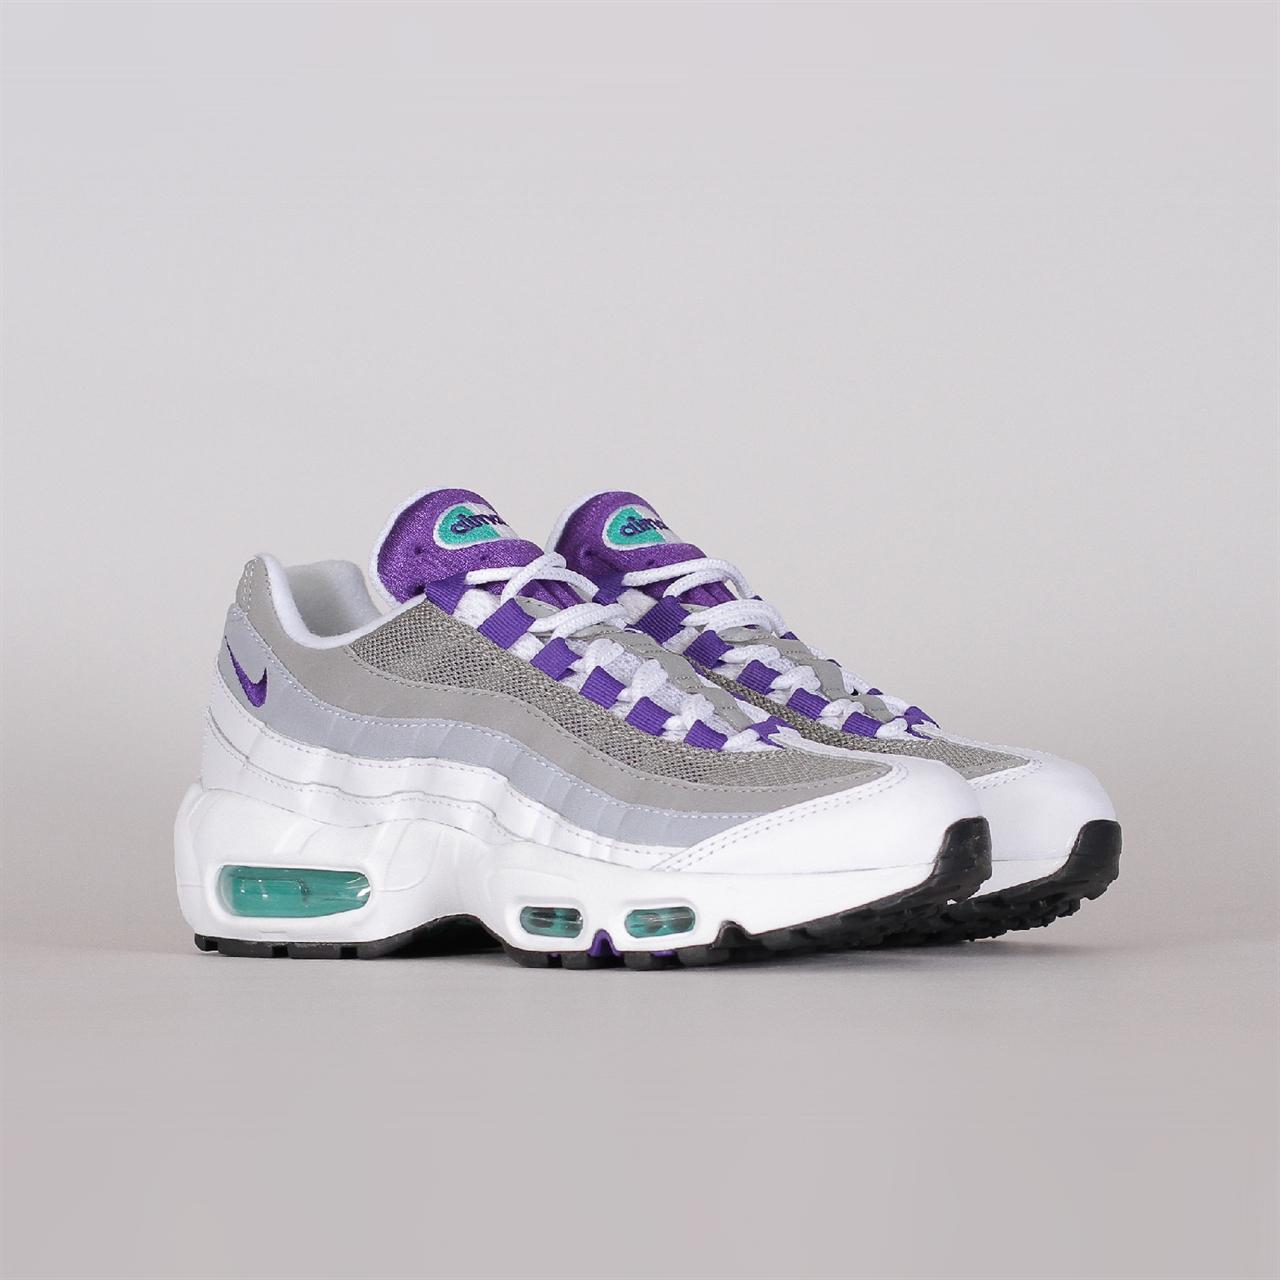 lowest price 88c2d e4679 nike sportswear womens air max 95 307960 109